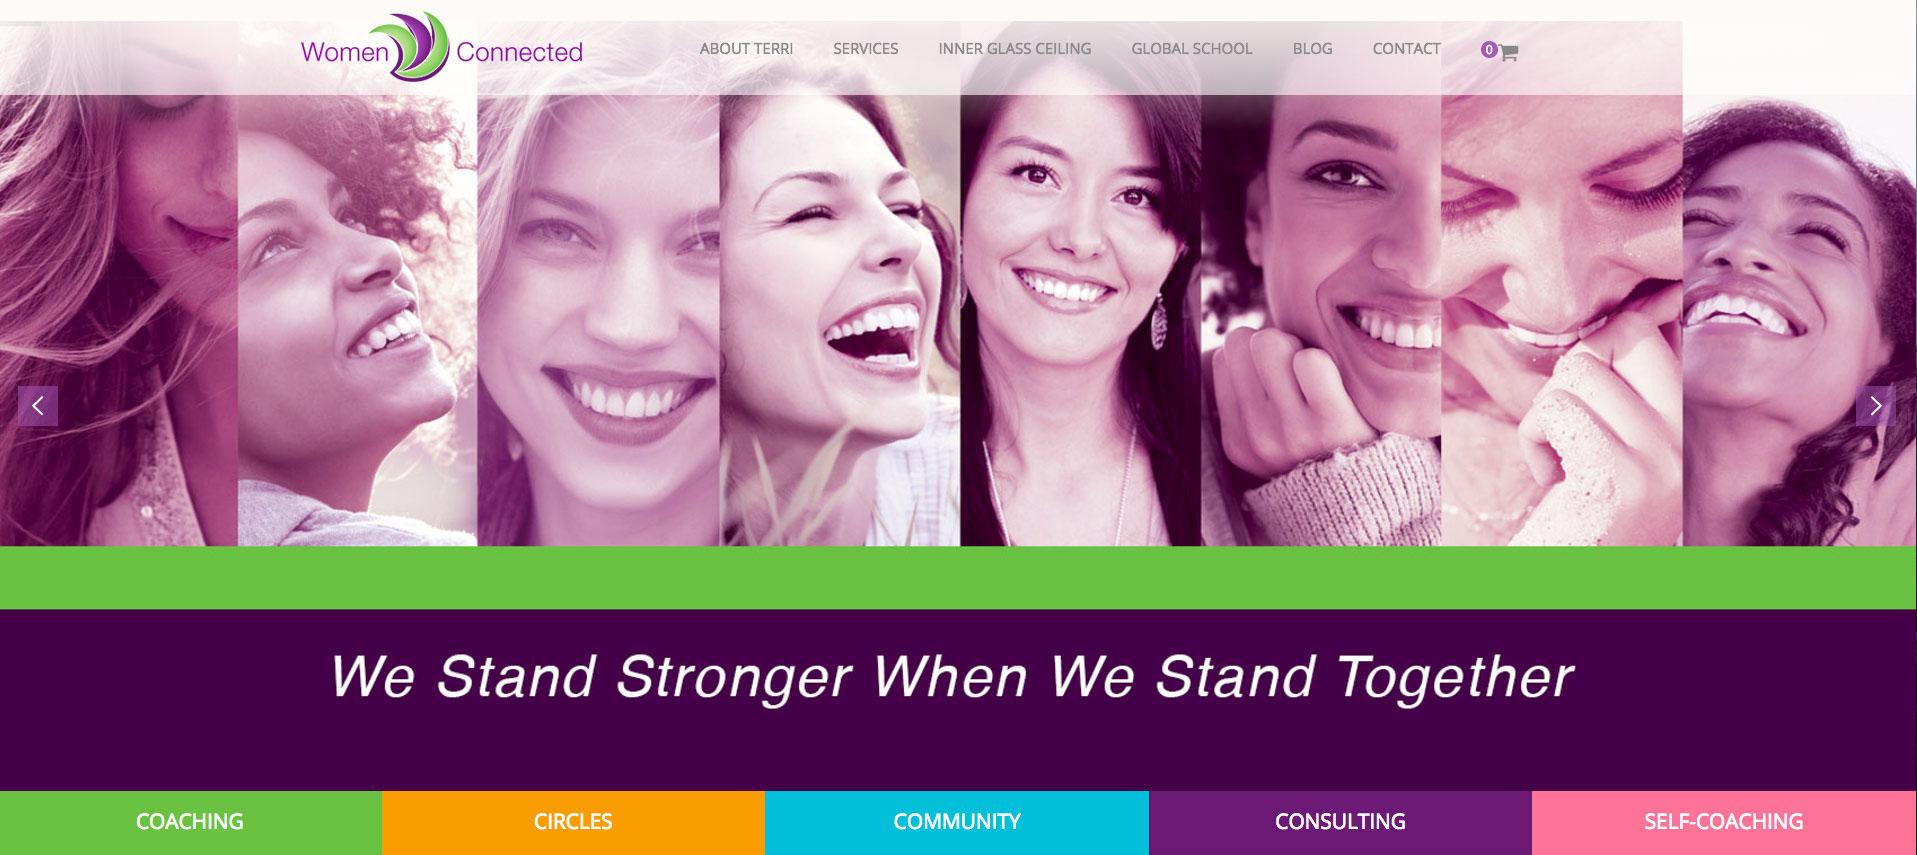 womenconnected.net